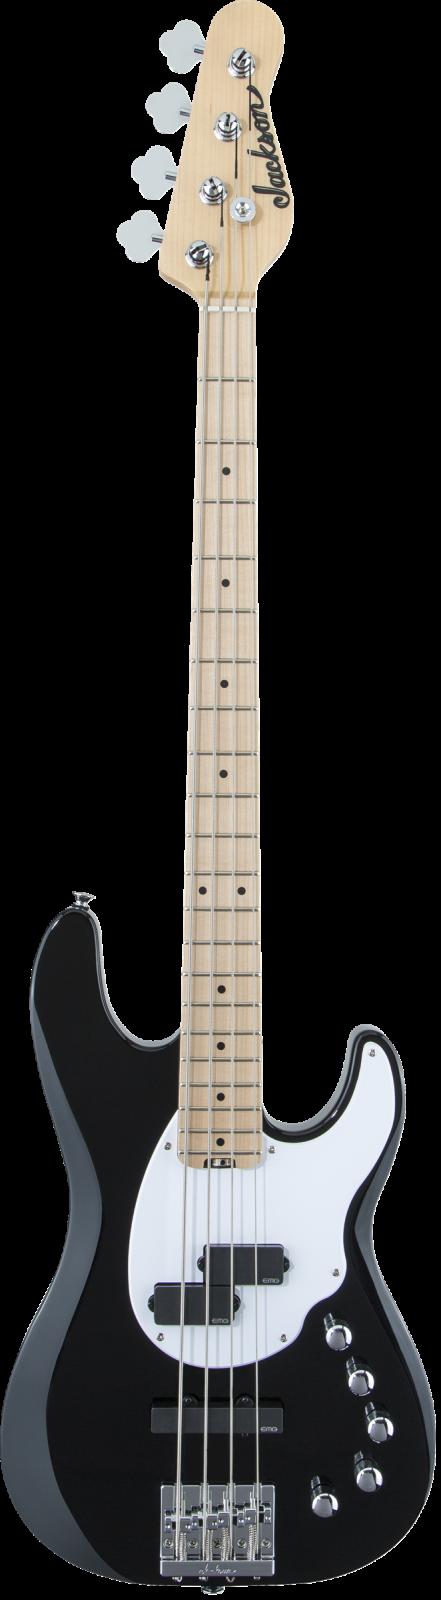 Jackson X Series Signature David Ellefson Concert Bass CBXM IV Maple Fingerboard Gloss Black